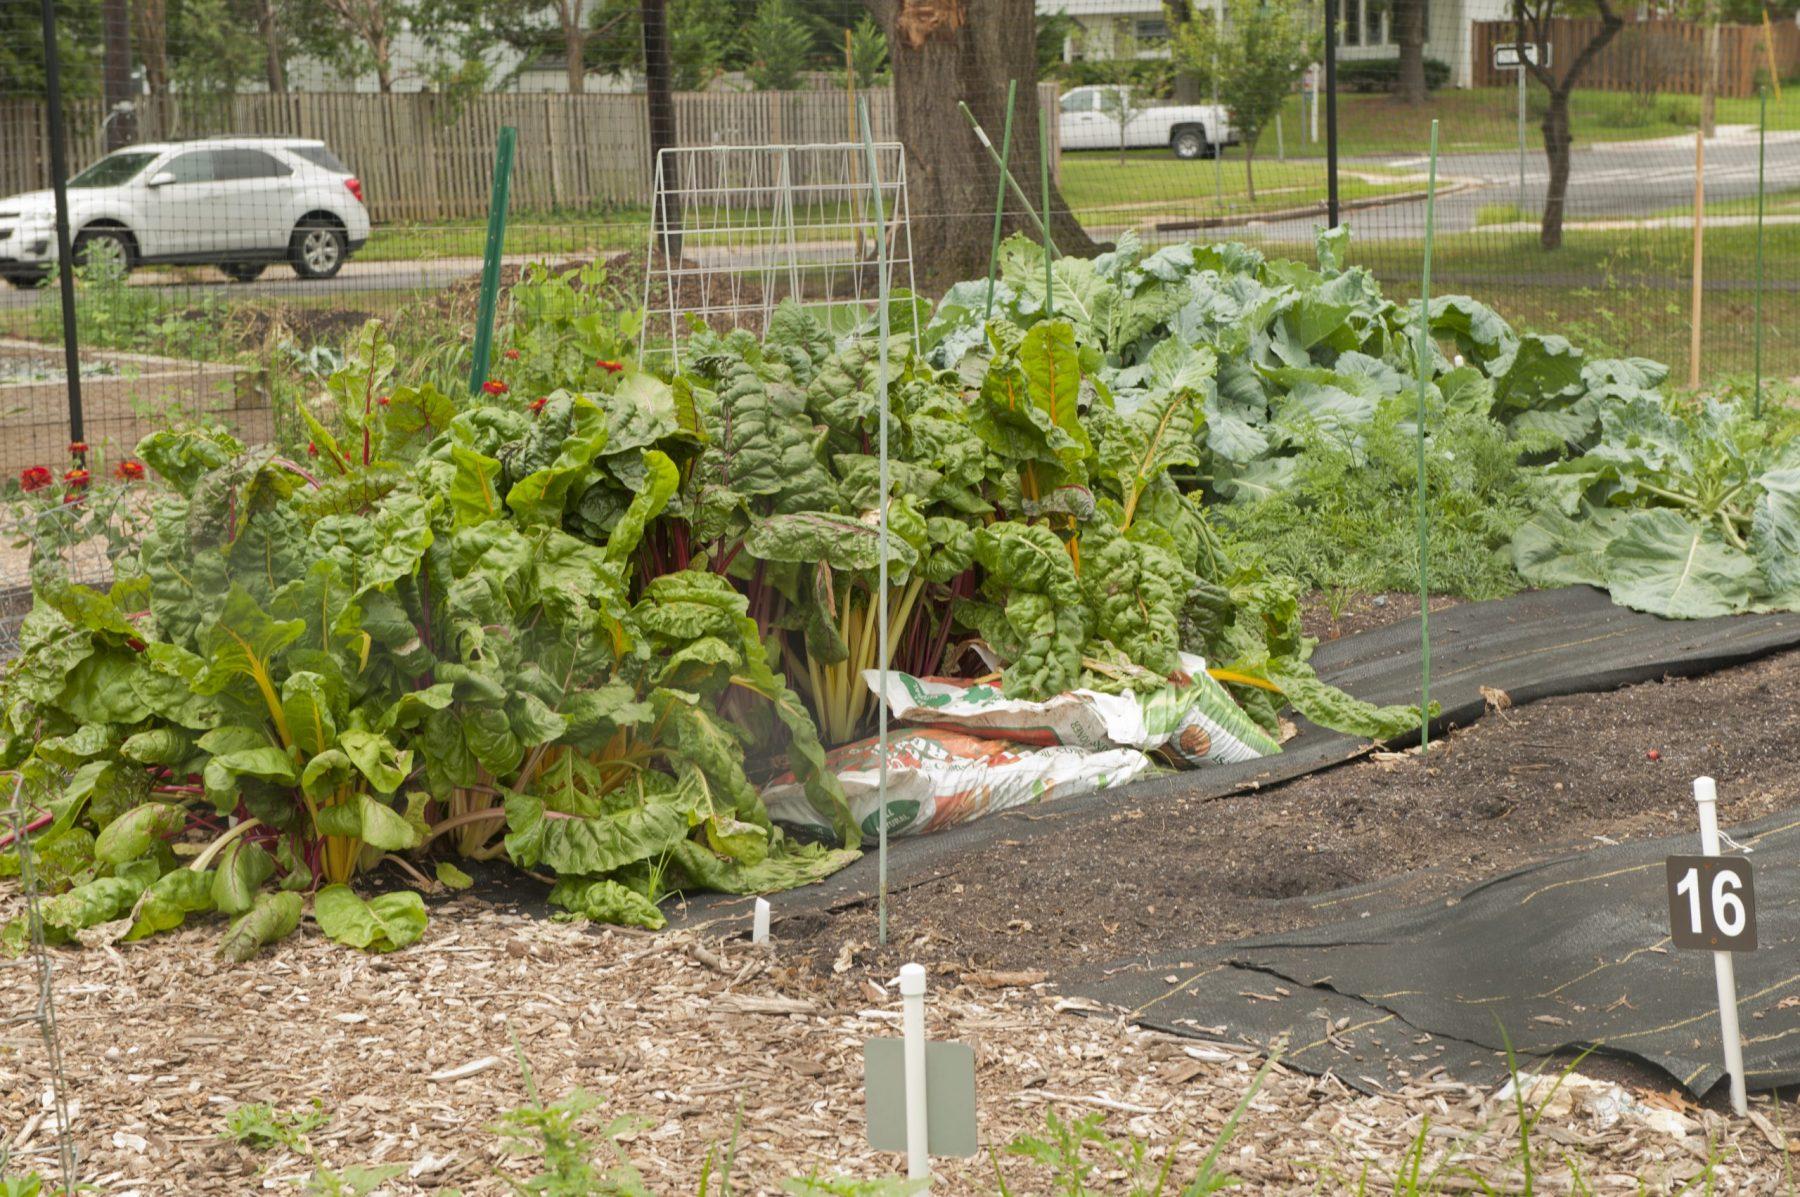 The Community Gardens Program